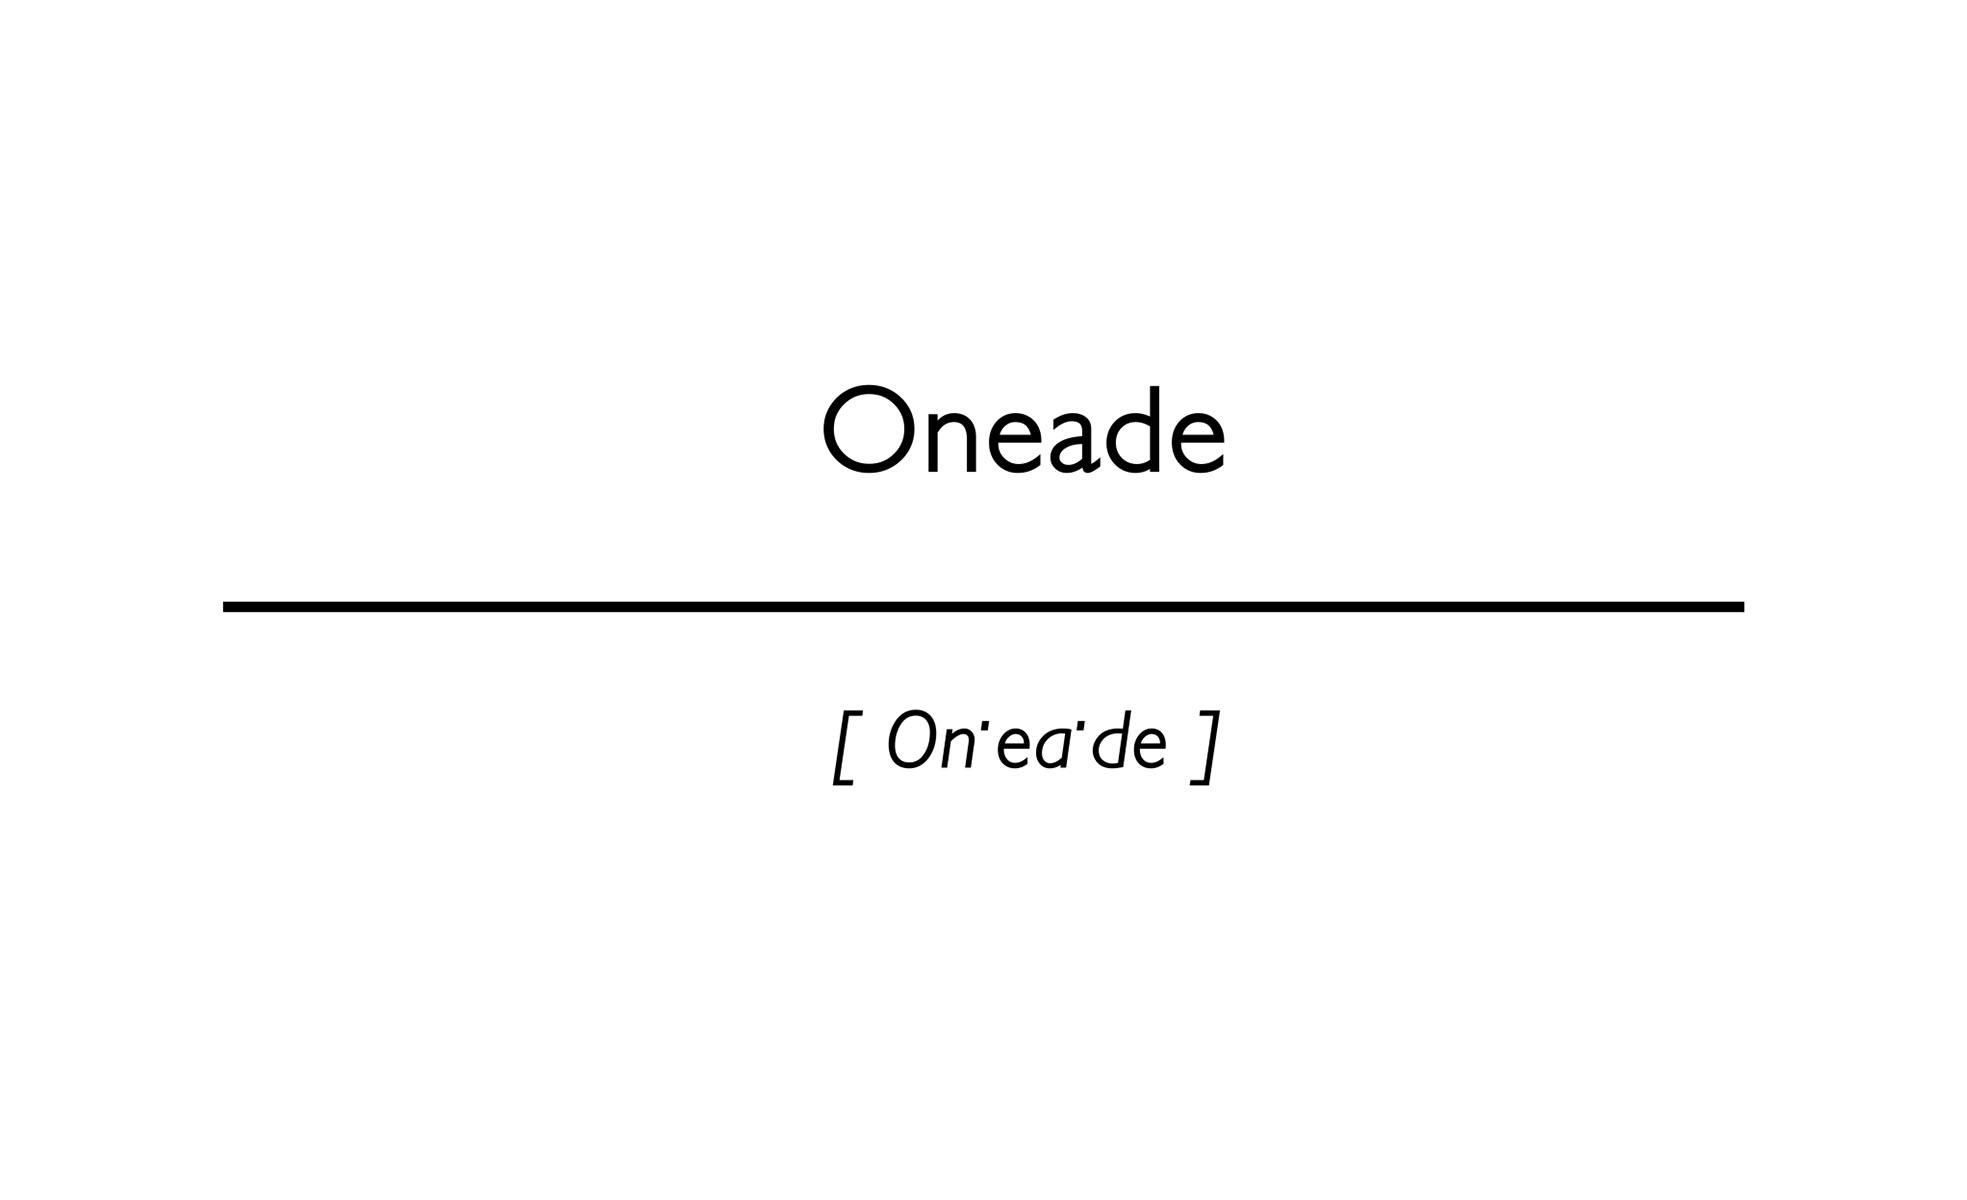 word Oneade